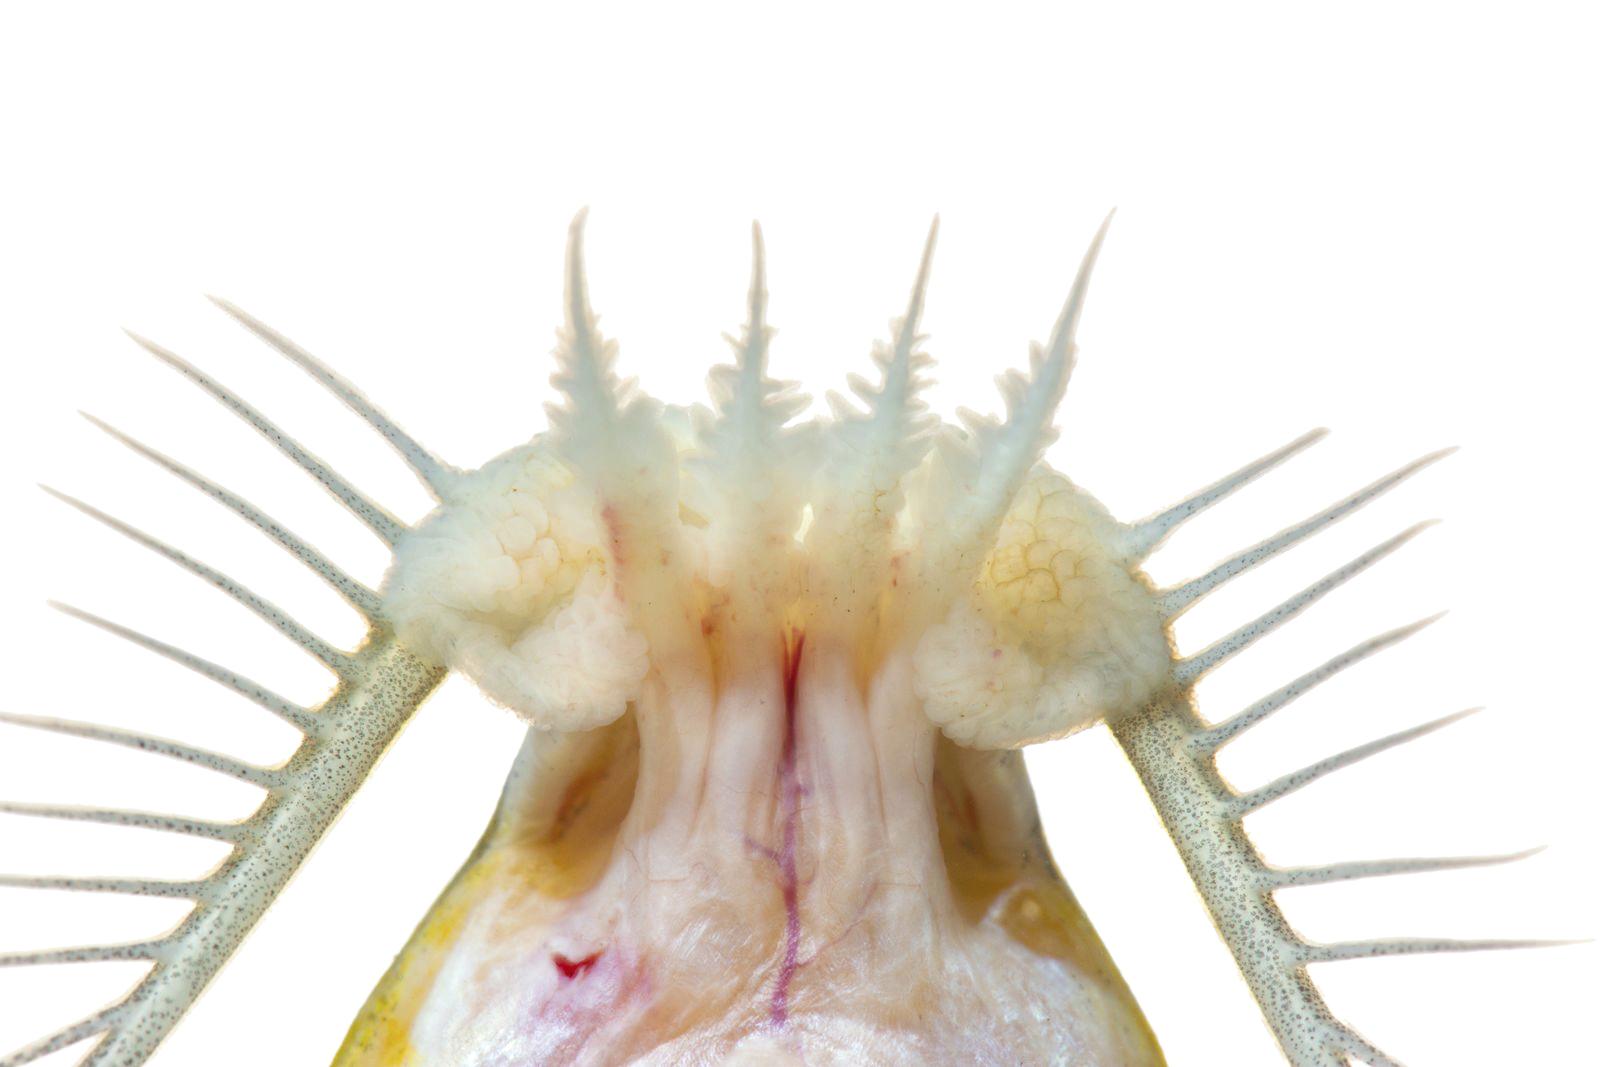 Imagen Detalle ventral de la boca de Doras sp CavFish Unibagué